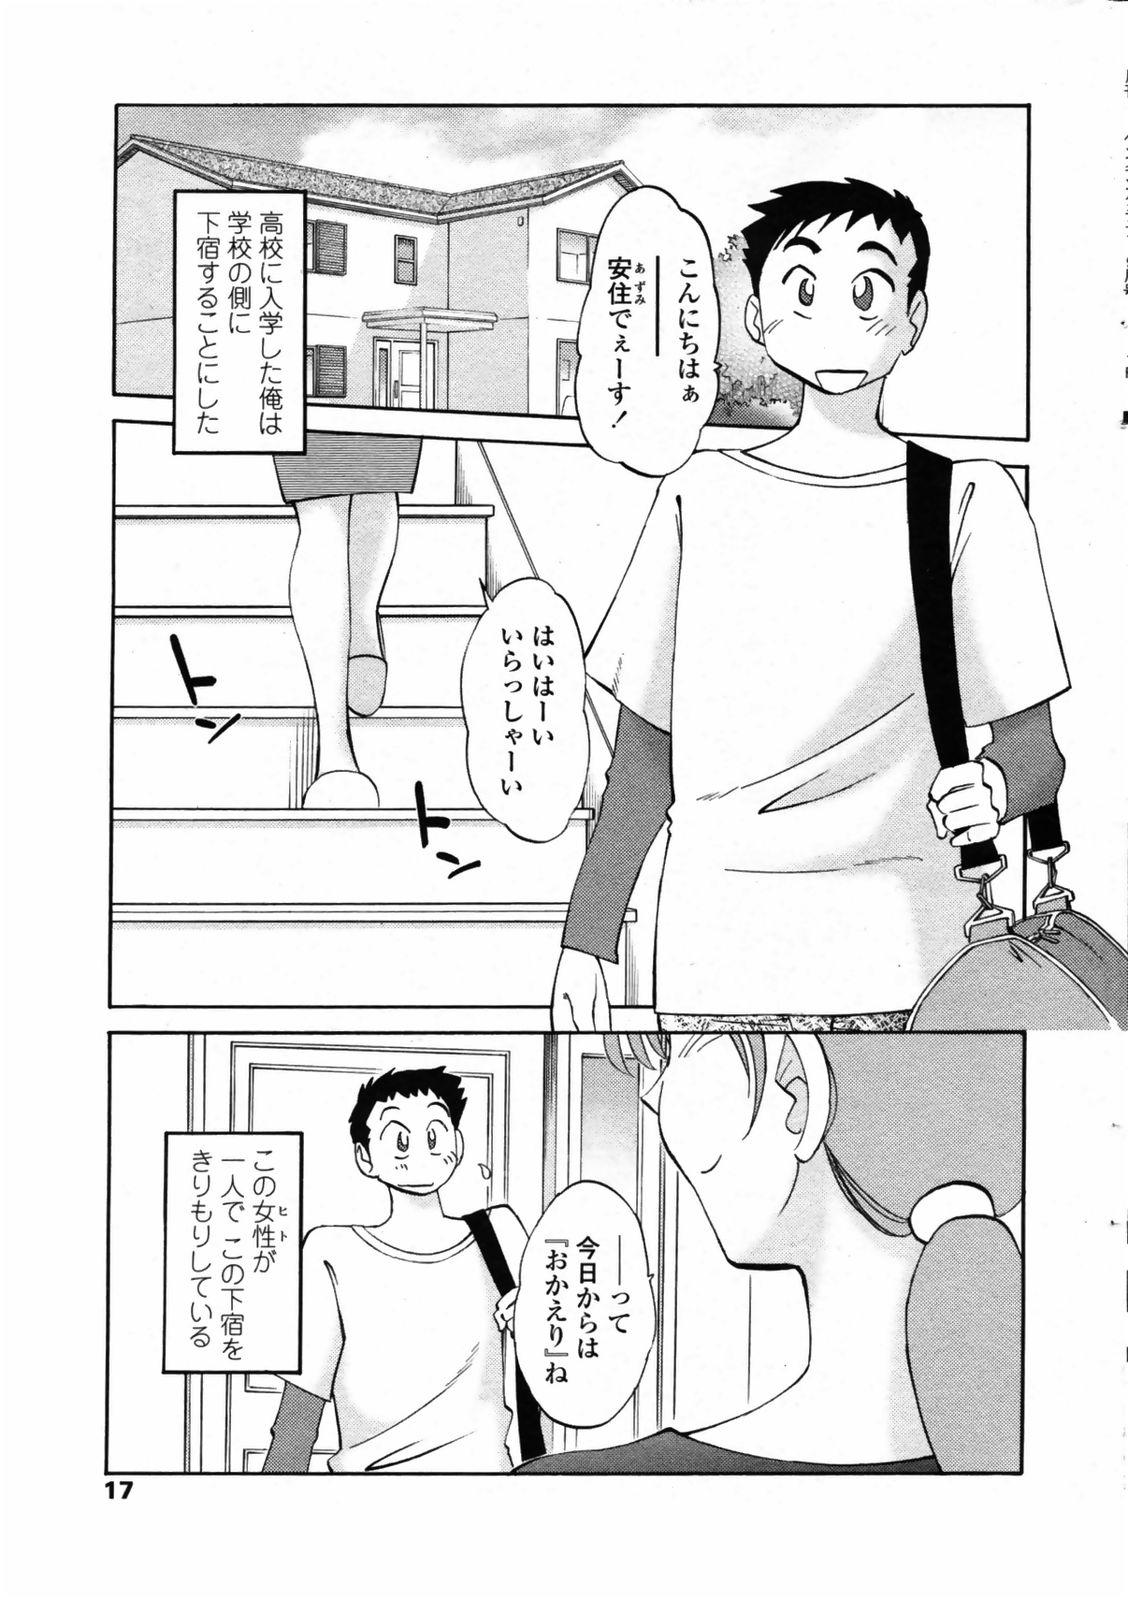 [Tsuyatsuya] Azumi-kun to Issho chapt.1-5 (Comic Penguin Club) 15